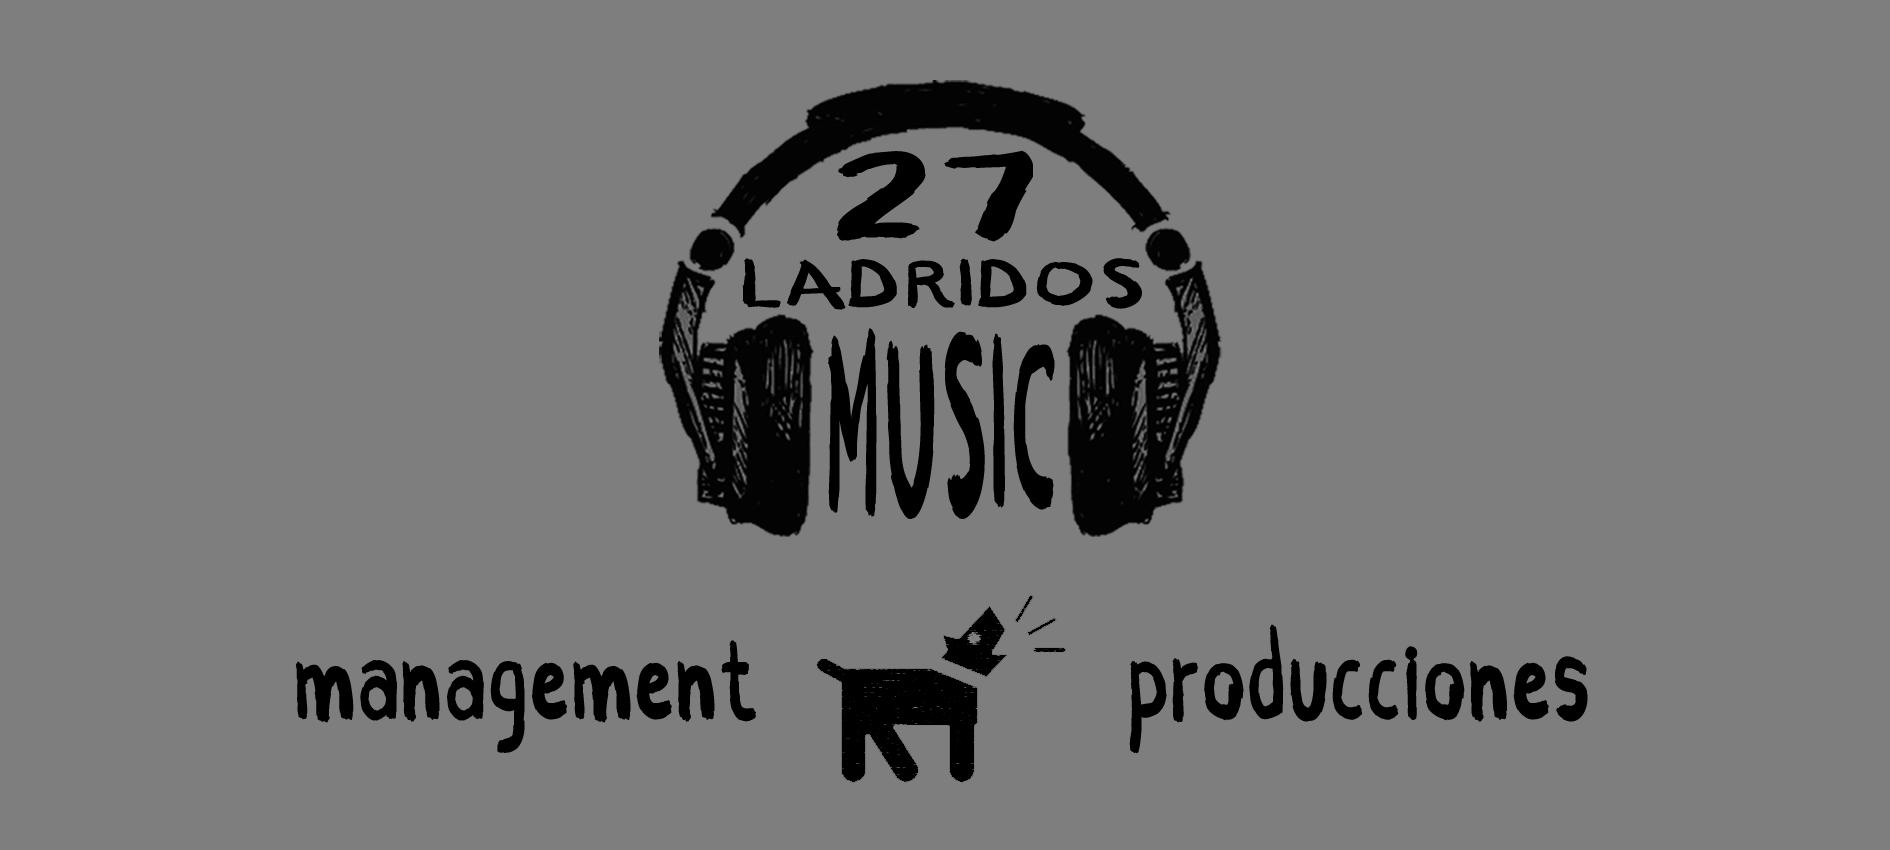 27 LADRIDOS